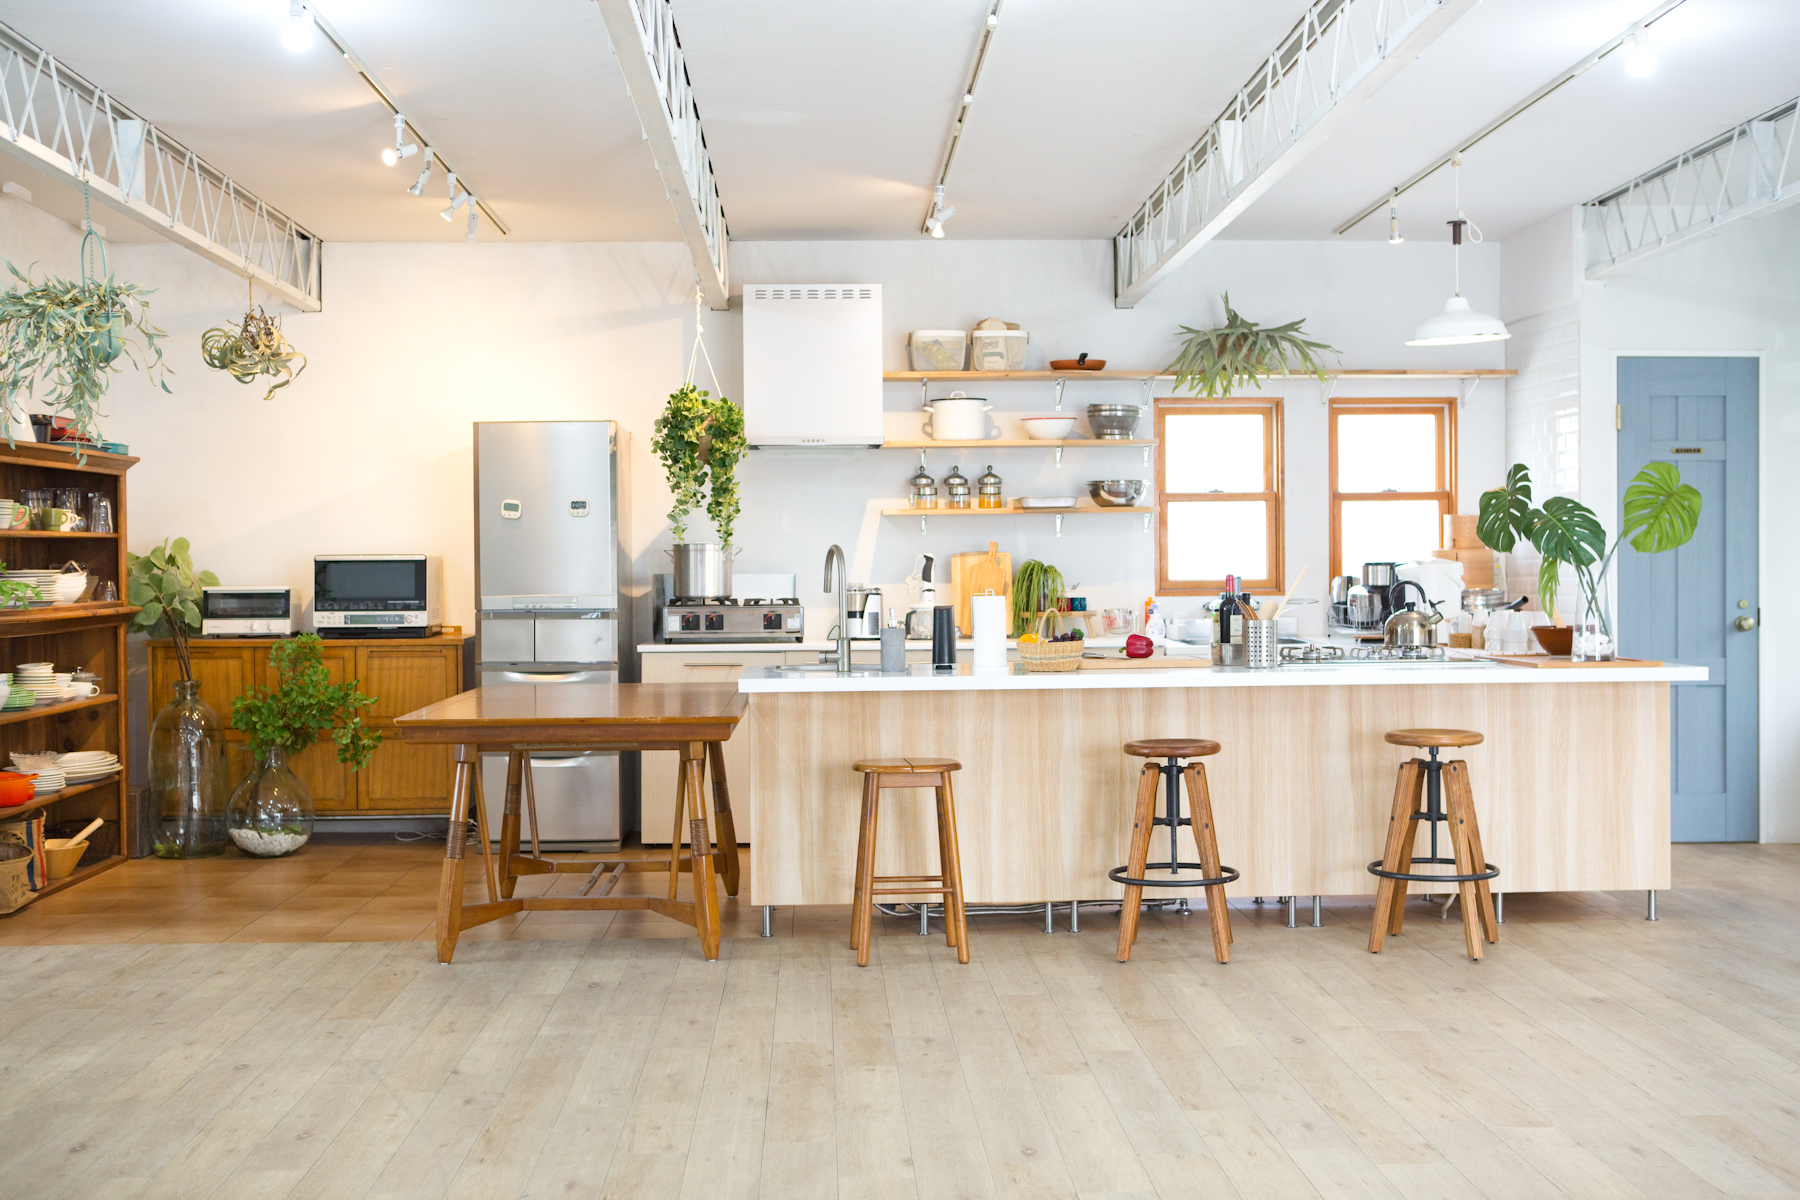 studio Licorne 野毛 (スタジオリコルネ)2st 対面キッチン